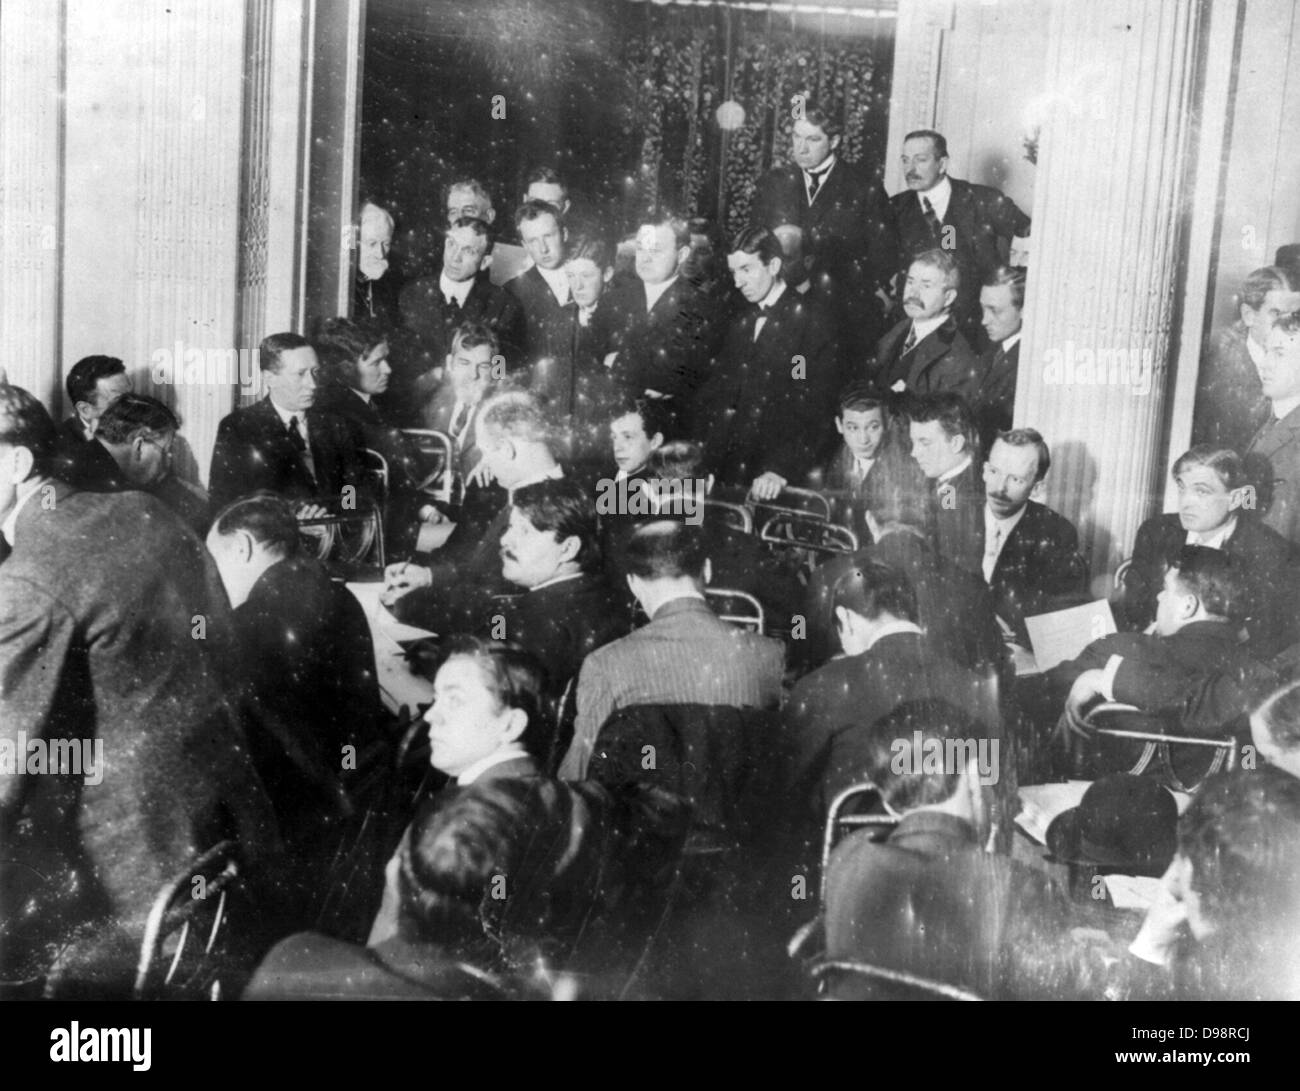 Titanic disaster, 12 April 1912: USA Senate Investigating Committee questioning survivors at the Waldorf Astoria - Stock Image